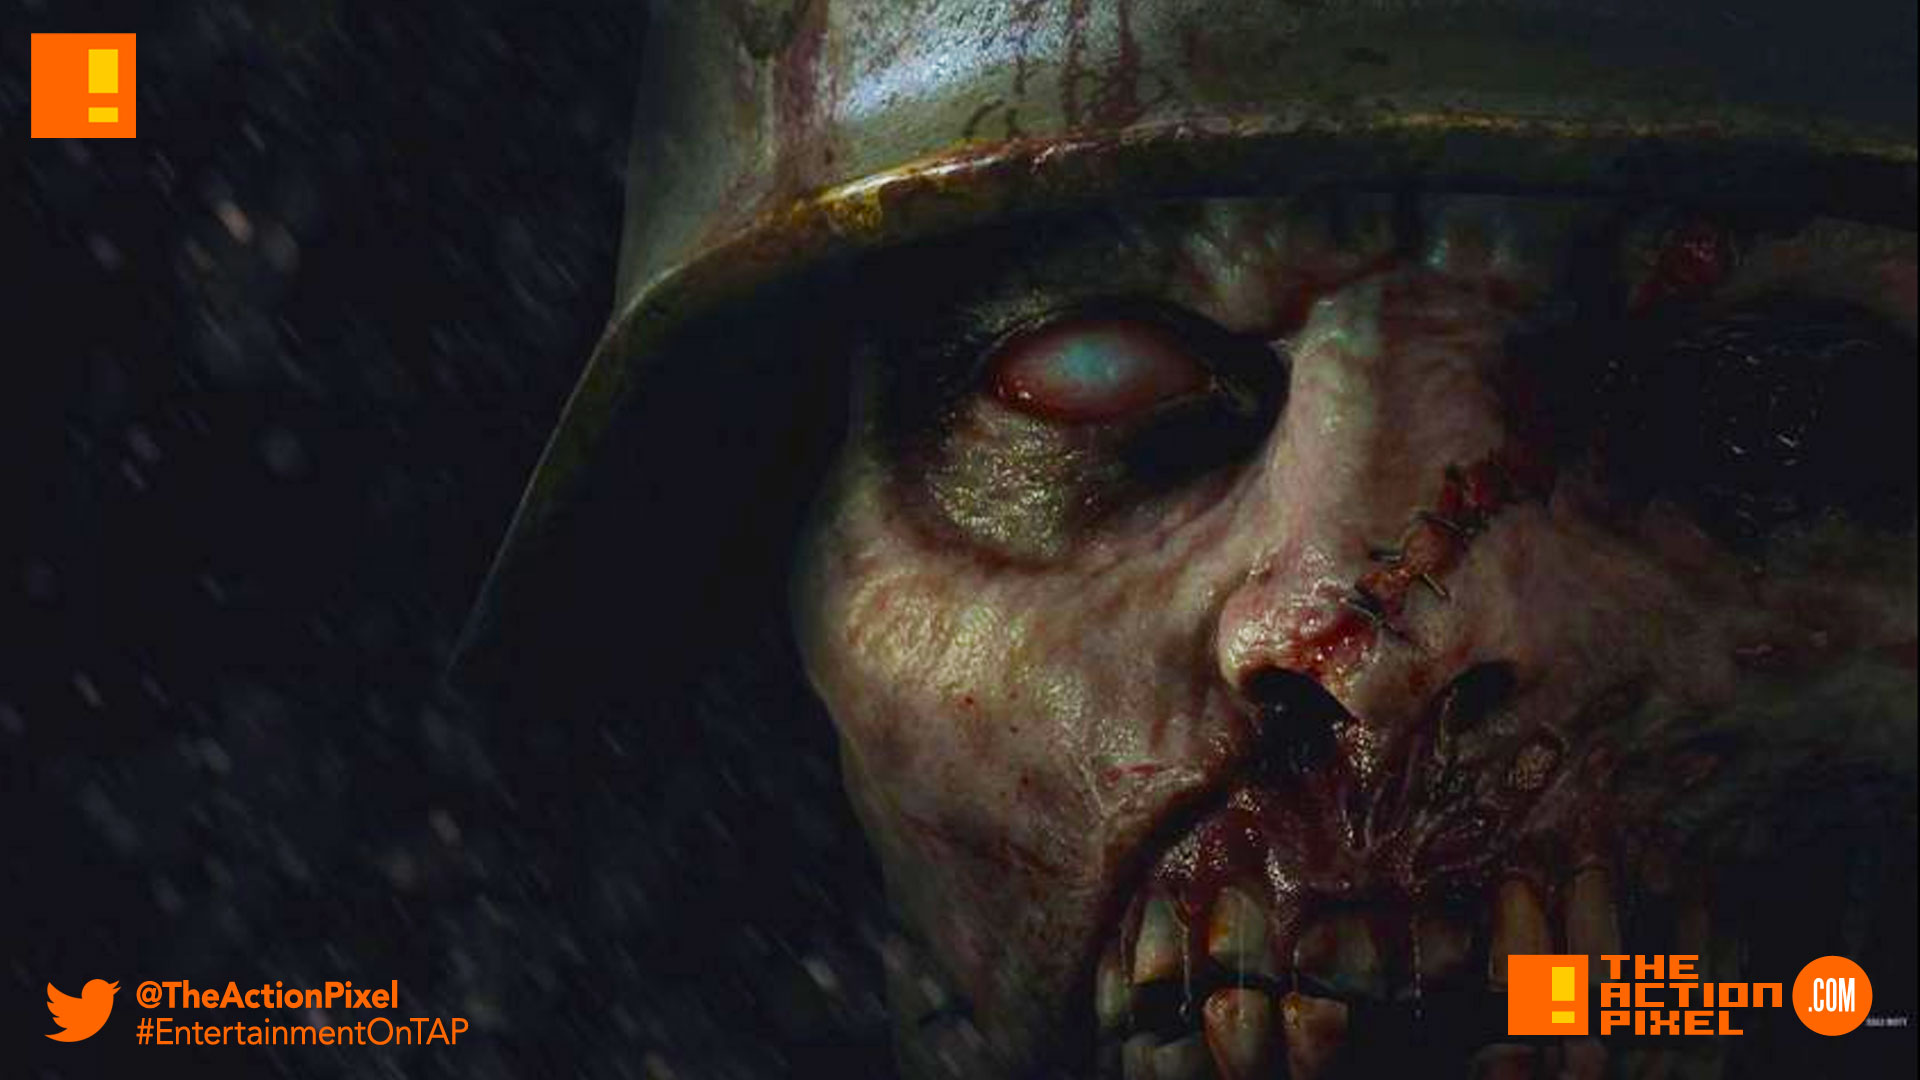 cod, ww2, call of duty, call of duty ww2, world war 2, trailer, reveal trailer,zombies,zombie